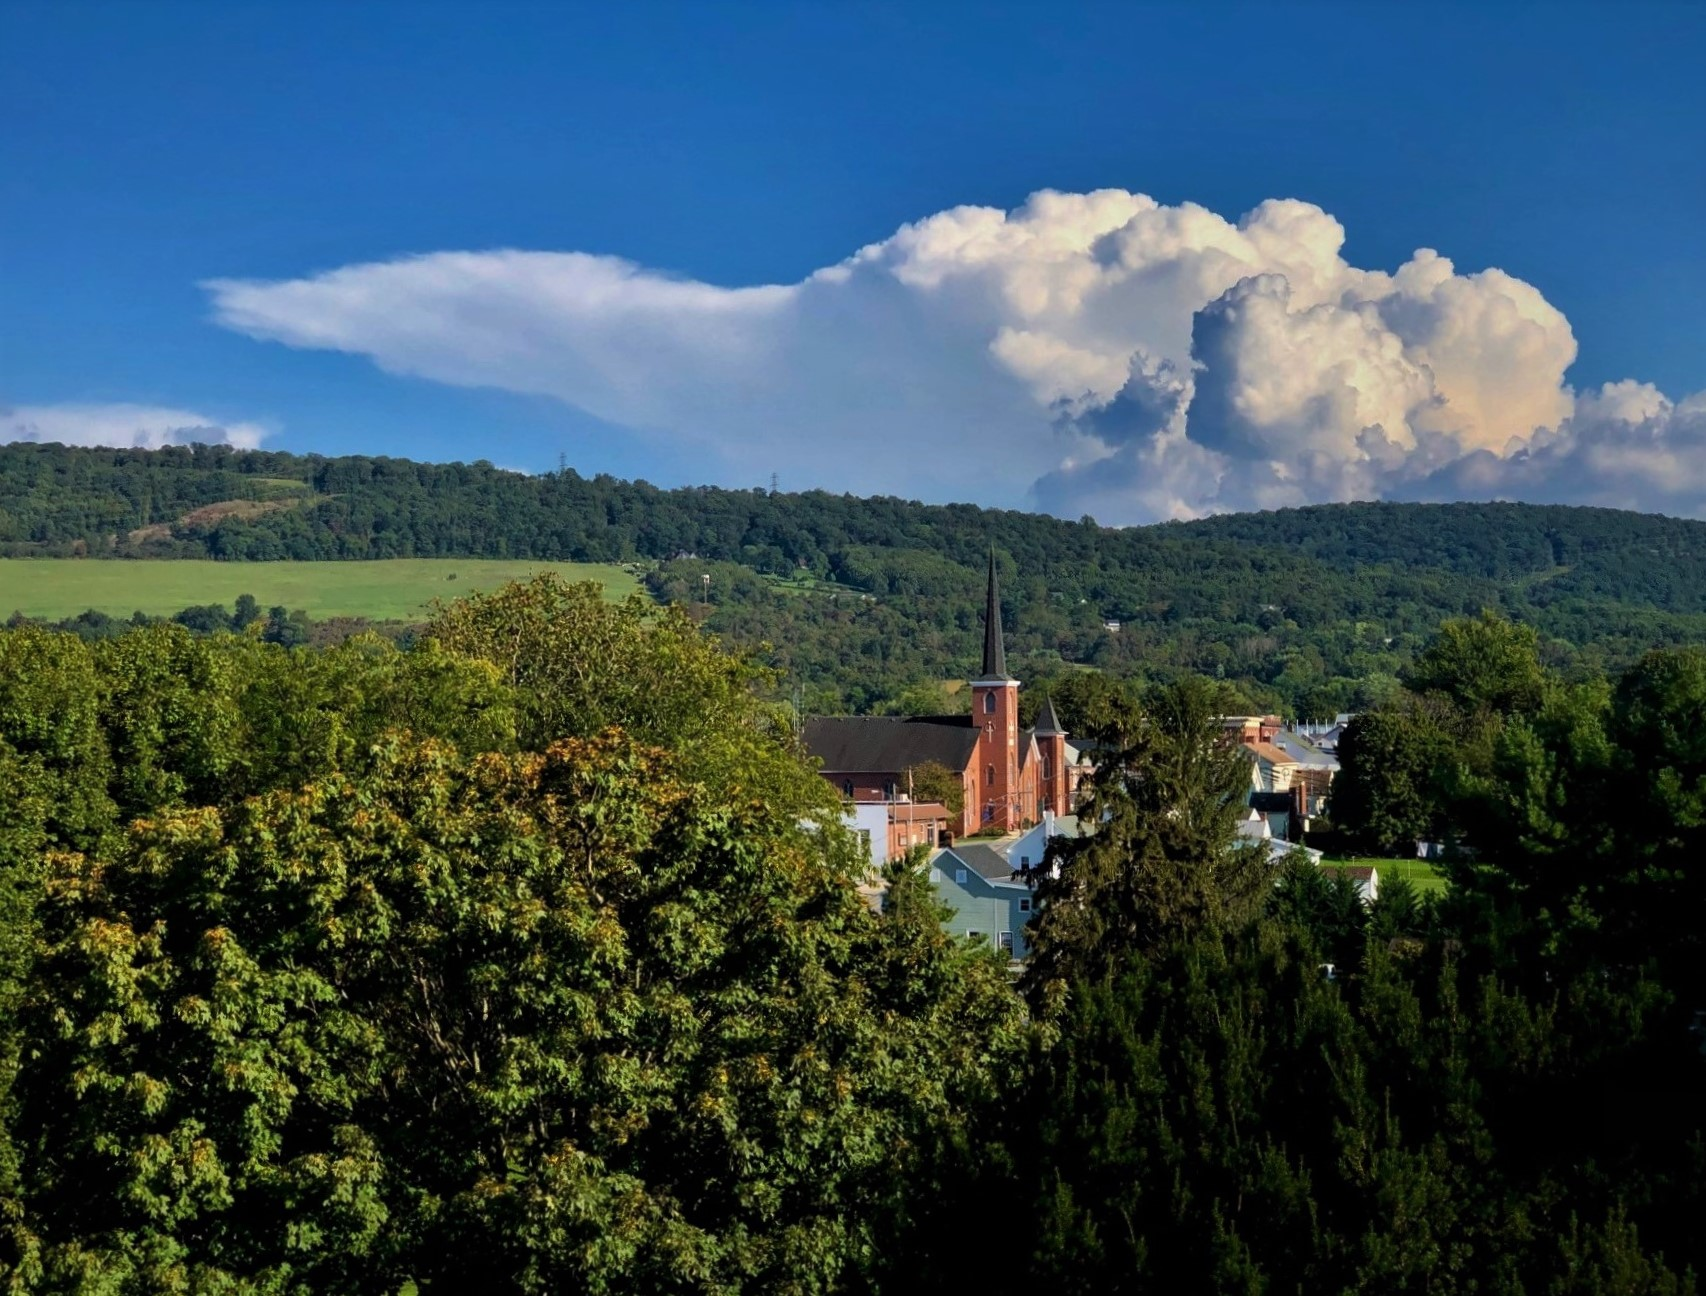 Weather4Smithsburg.com